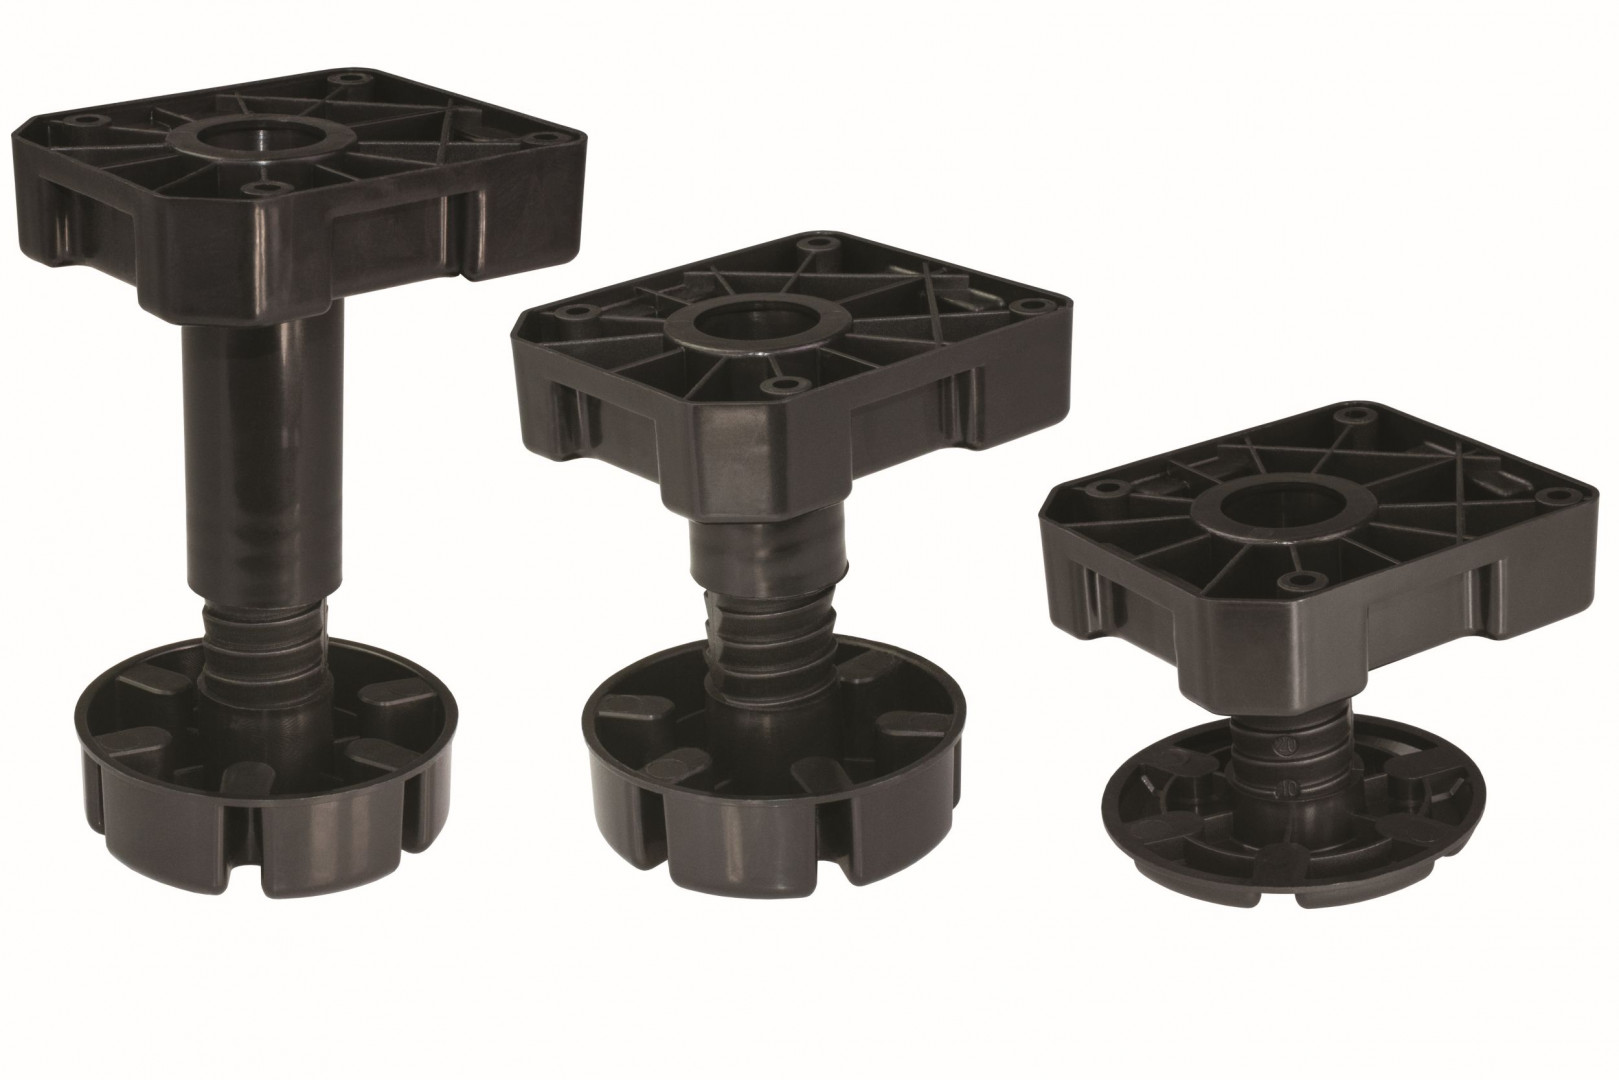 Regulowane nóżki meblowe firmy Sevroll-System. Fot. Sevroll-System